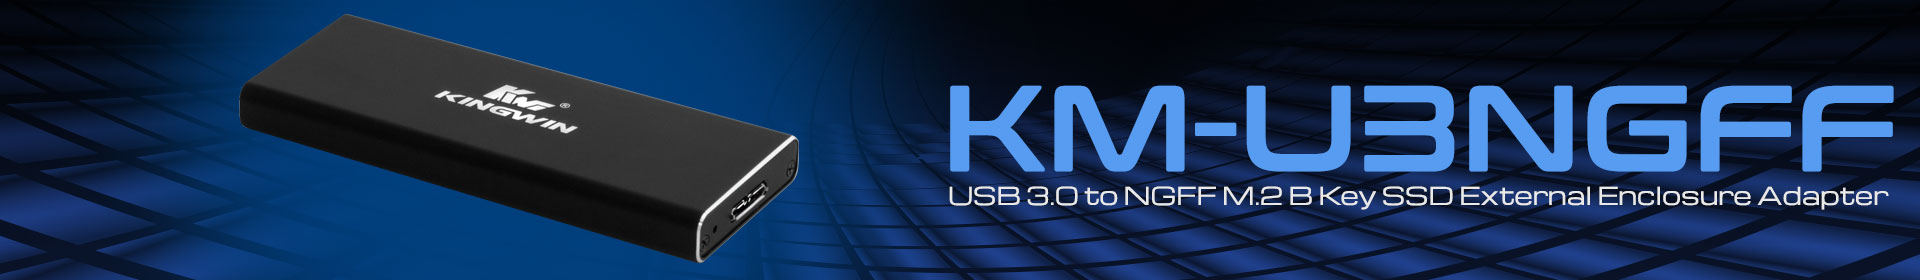 KMU3NGFF_WEB_BANNER2